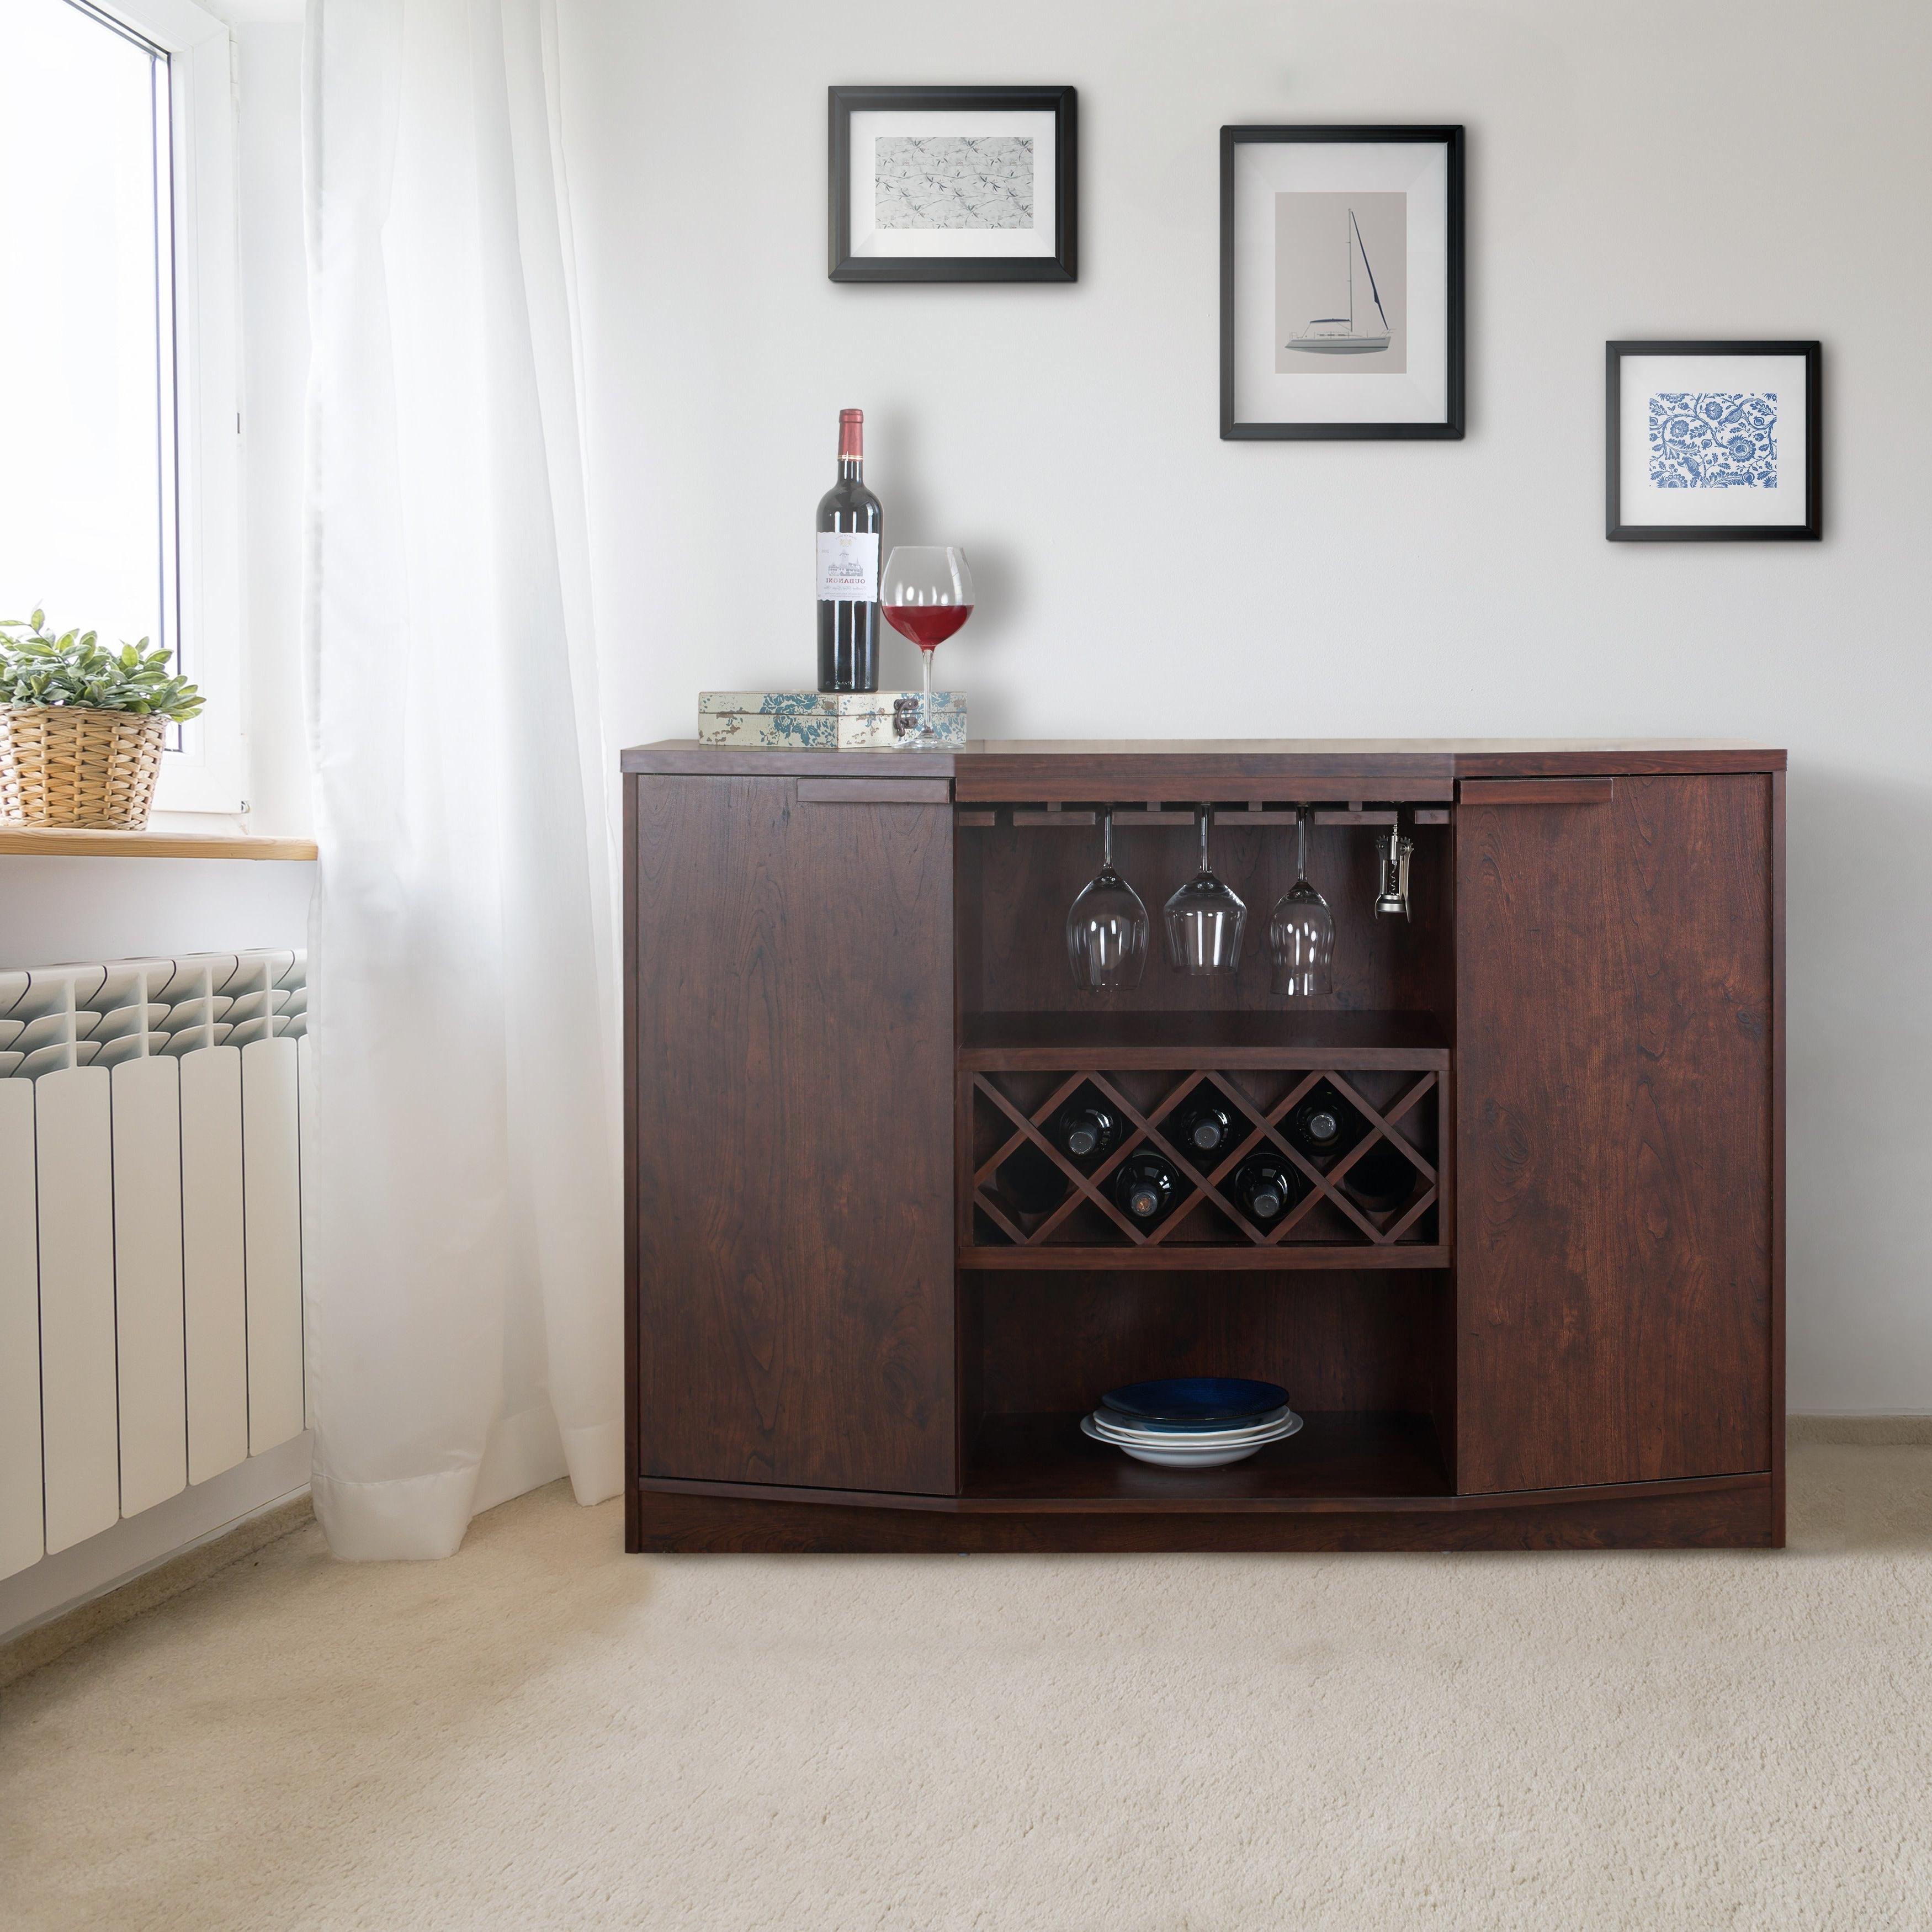 Chapline Contemporary Wine Bar Buffetfoa For Contemporary Wine Bar Buffets (View 5 of 20)